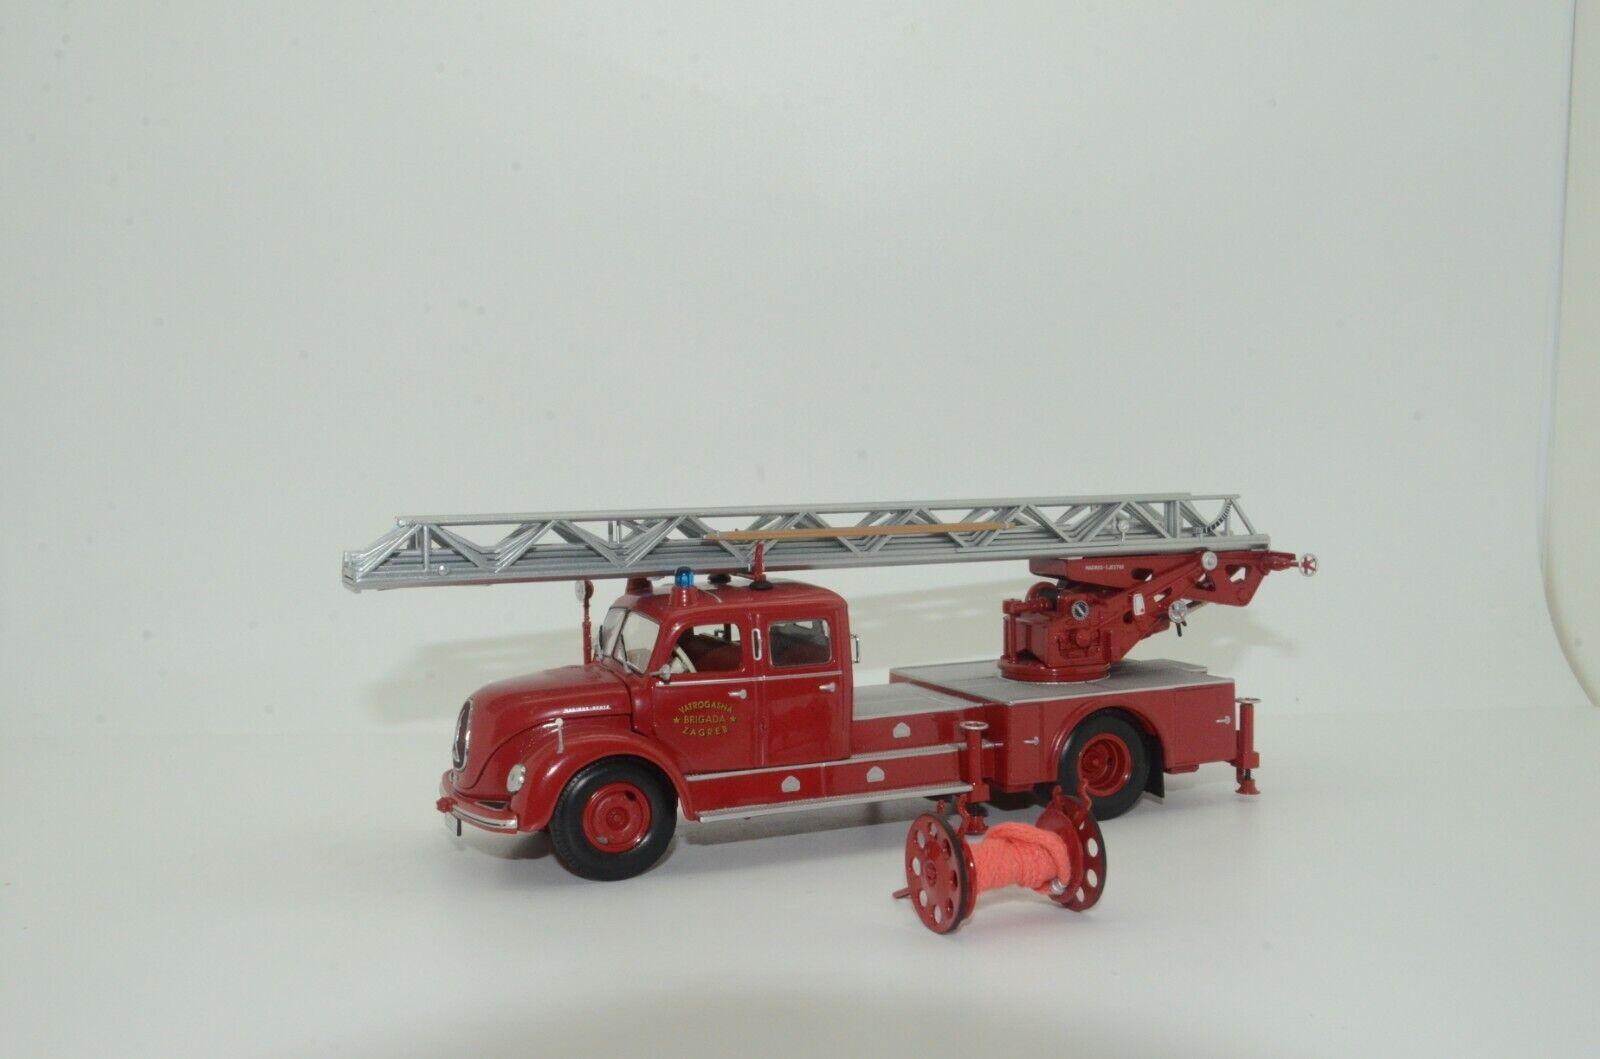 Magirus S 6500 DREHLEITER DL30 Zagreb camión de bomberos 1956 Minichamps 140072 1 43